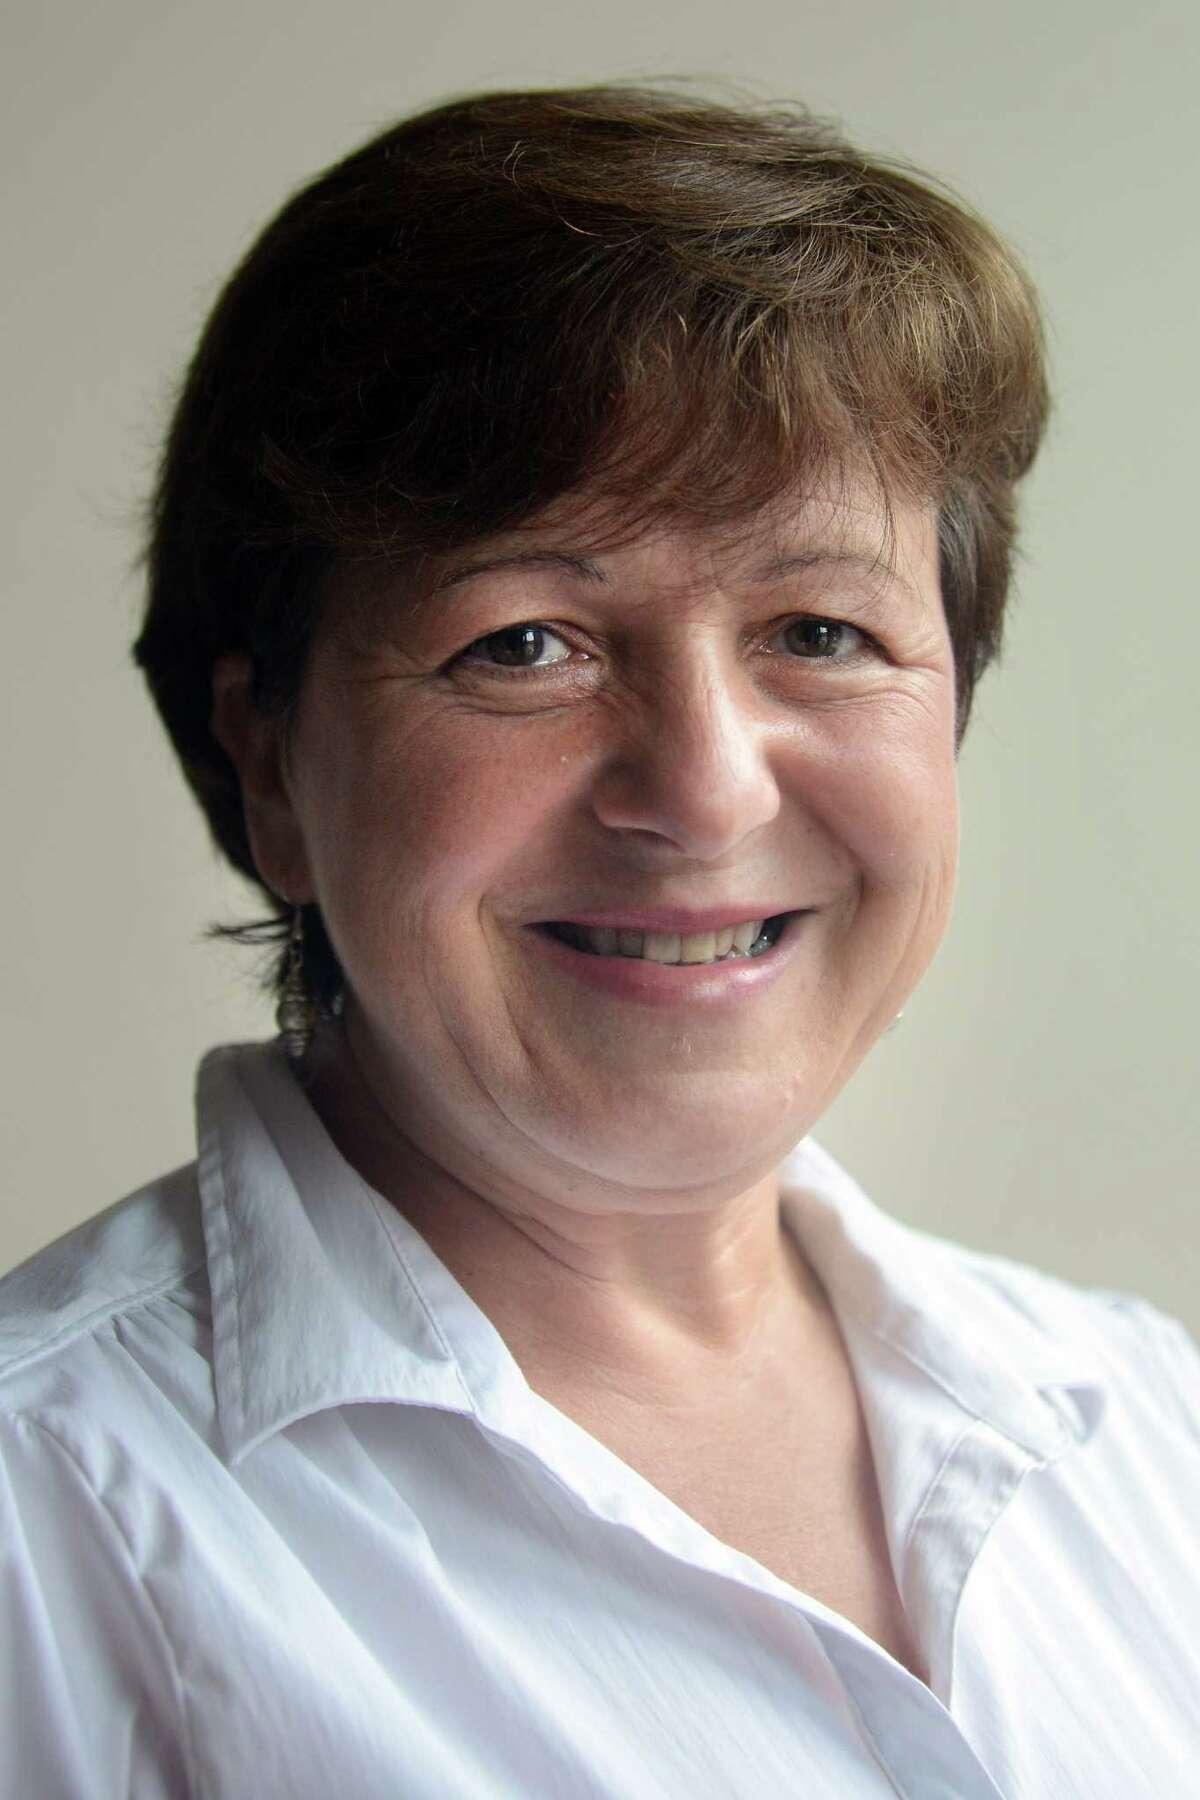 Anita Dugatto, democratic candidate for mayor of Derby, Conn.